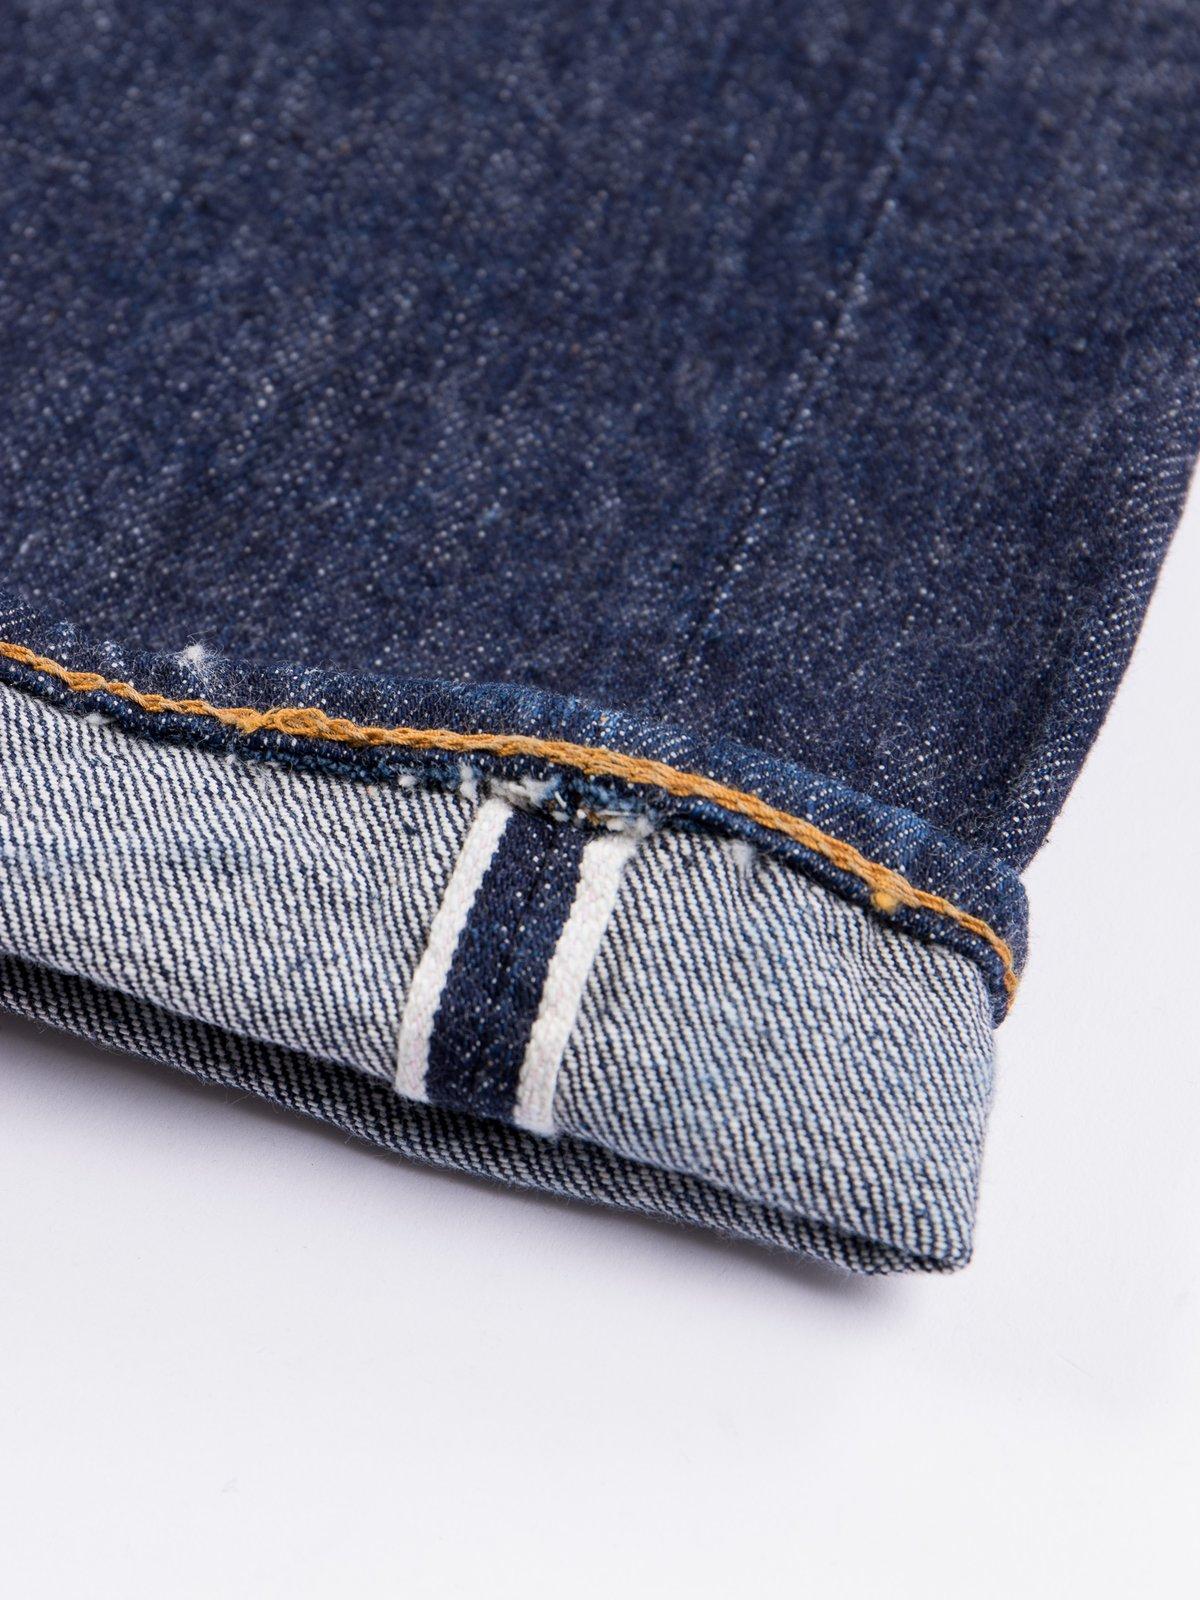 Indigo One Wash 105 Standard 5 Pocket Jean - Image 5